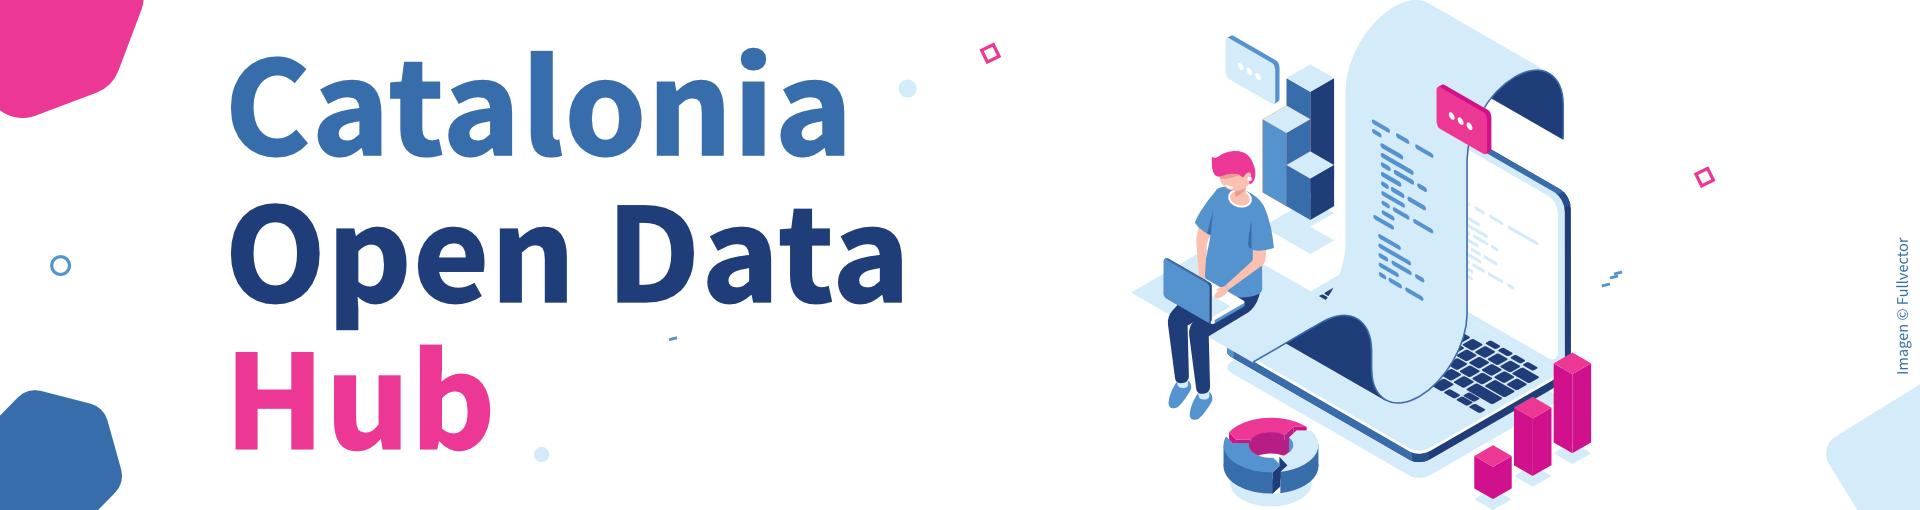 Catalunya Open Data Hub